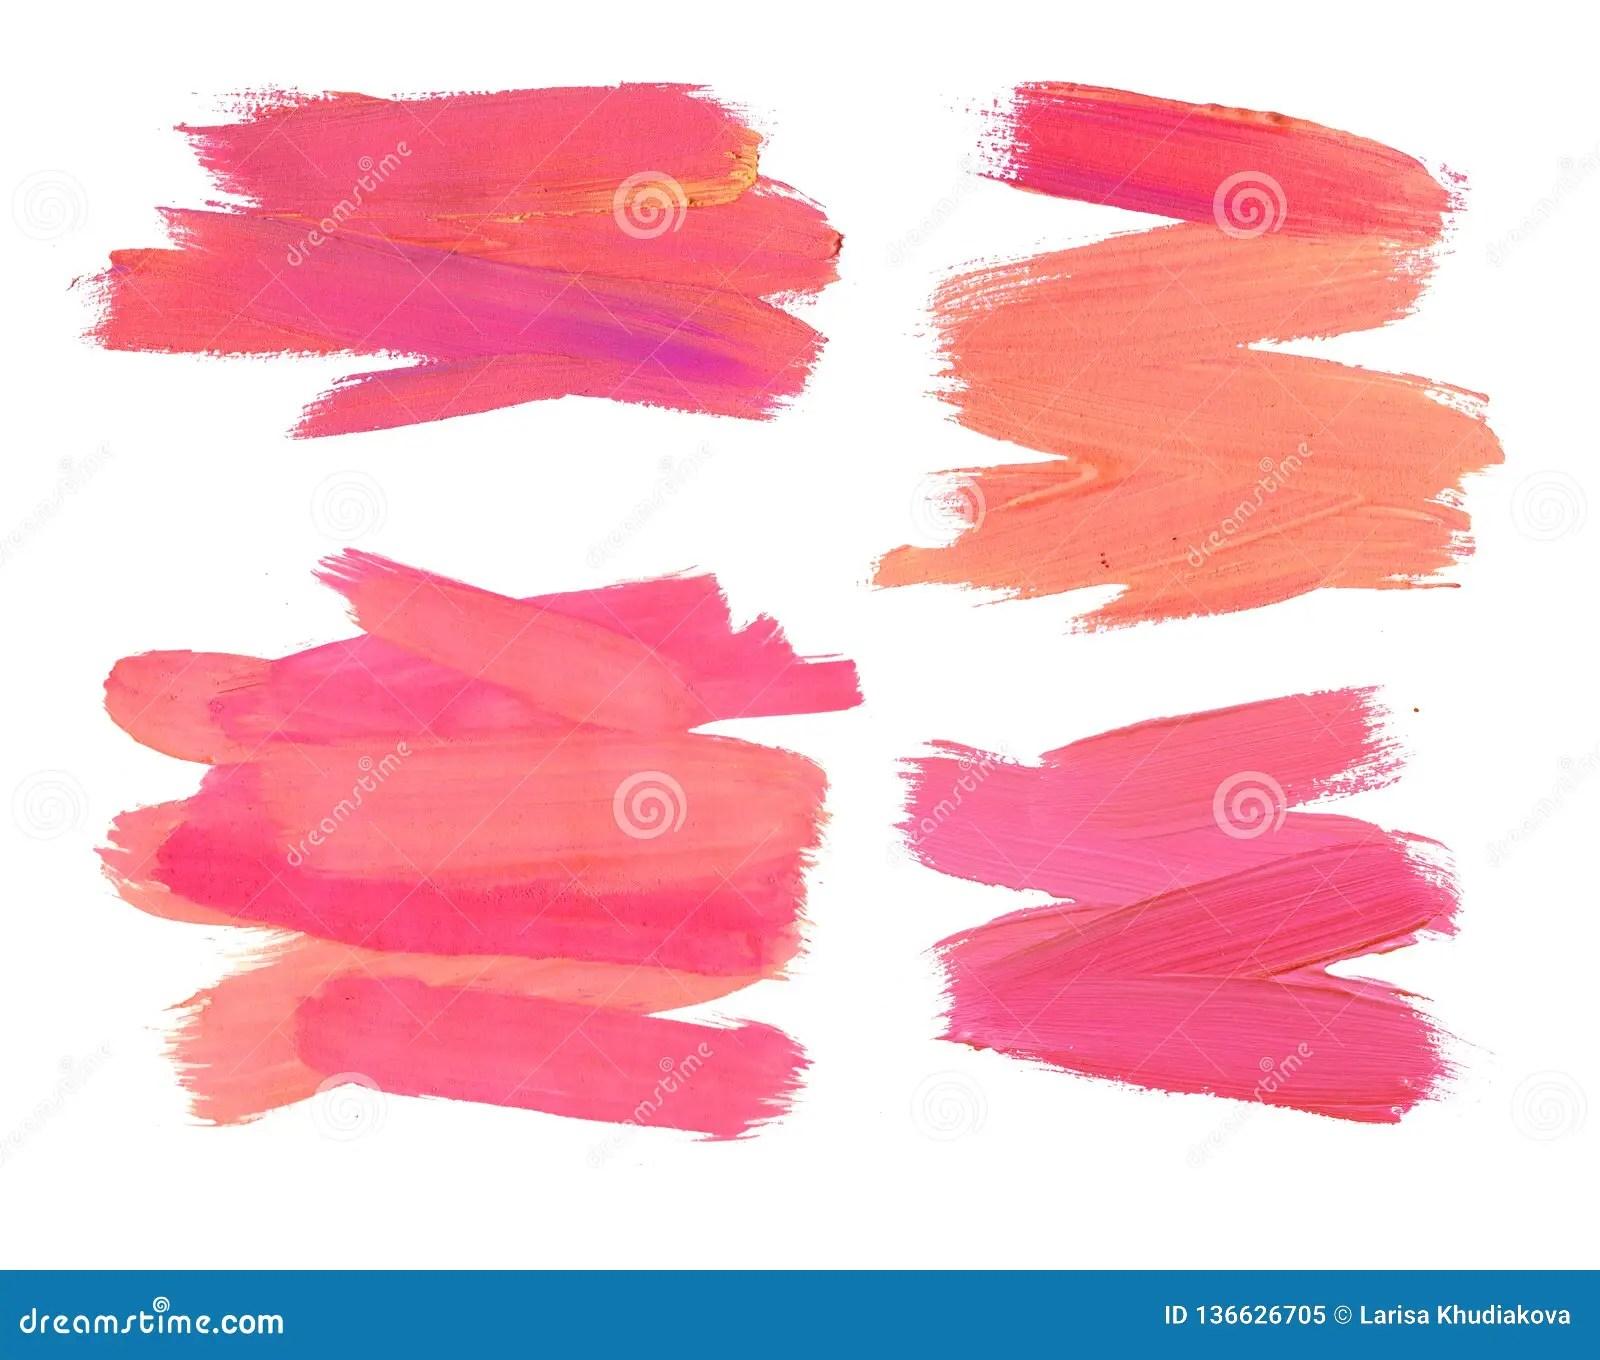 craft label brush stroke